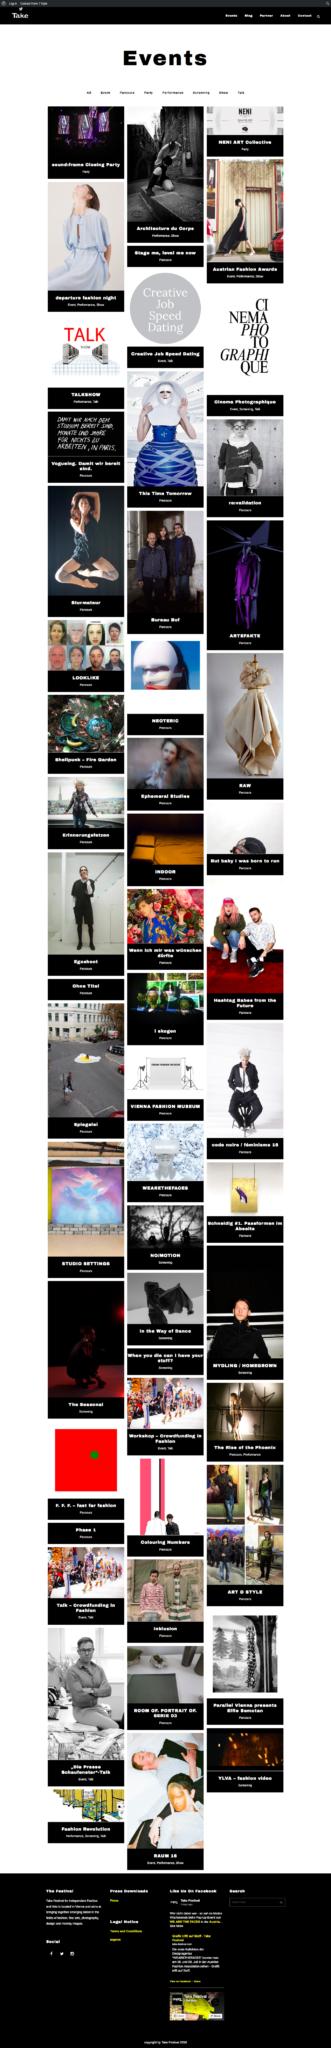 Take Festival by 36 digital&more Website Design